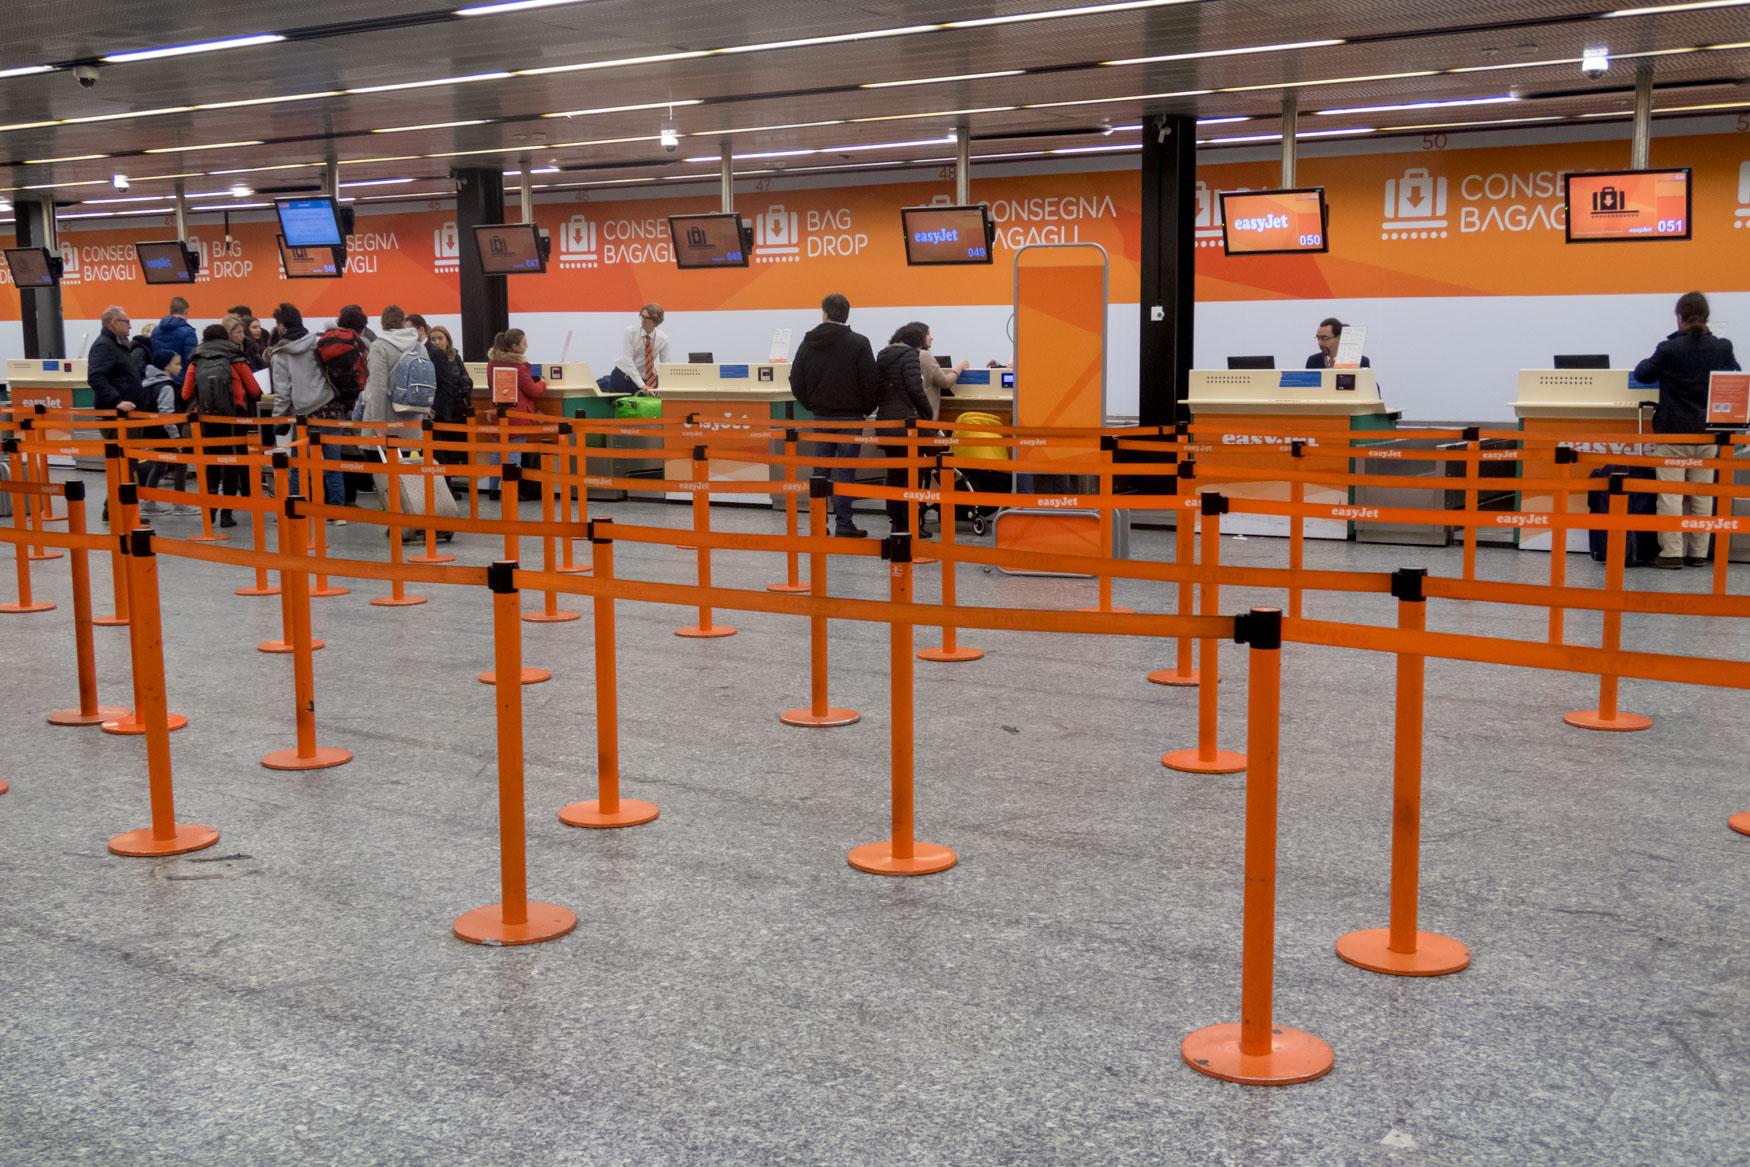 easyJet Check-in Desks at Malpensa Terminal 2